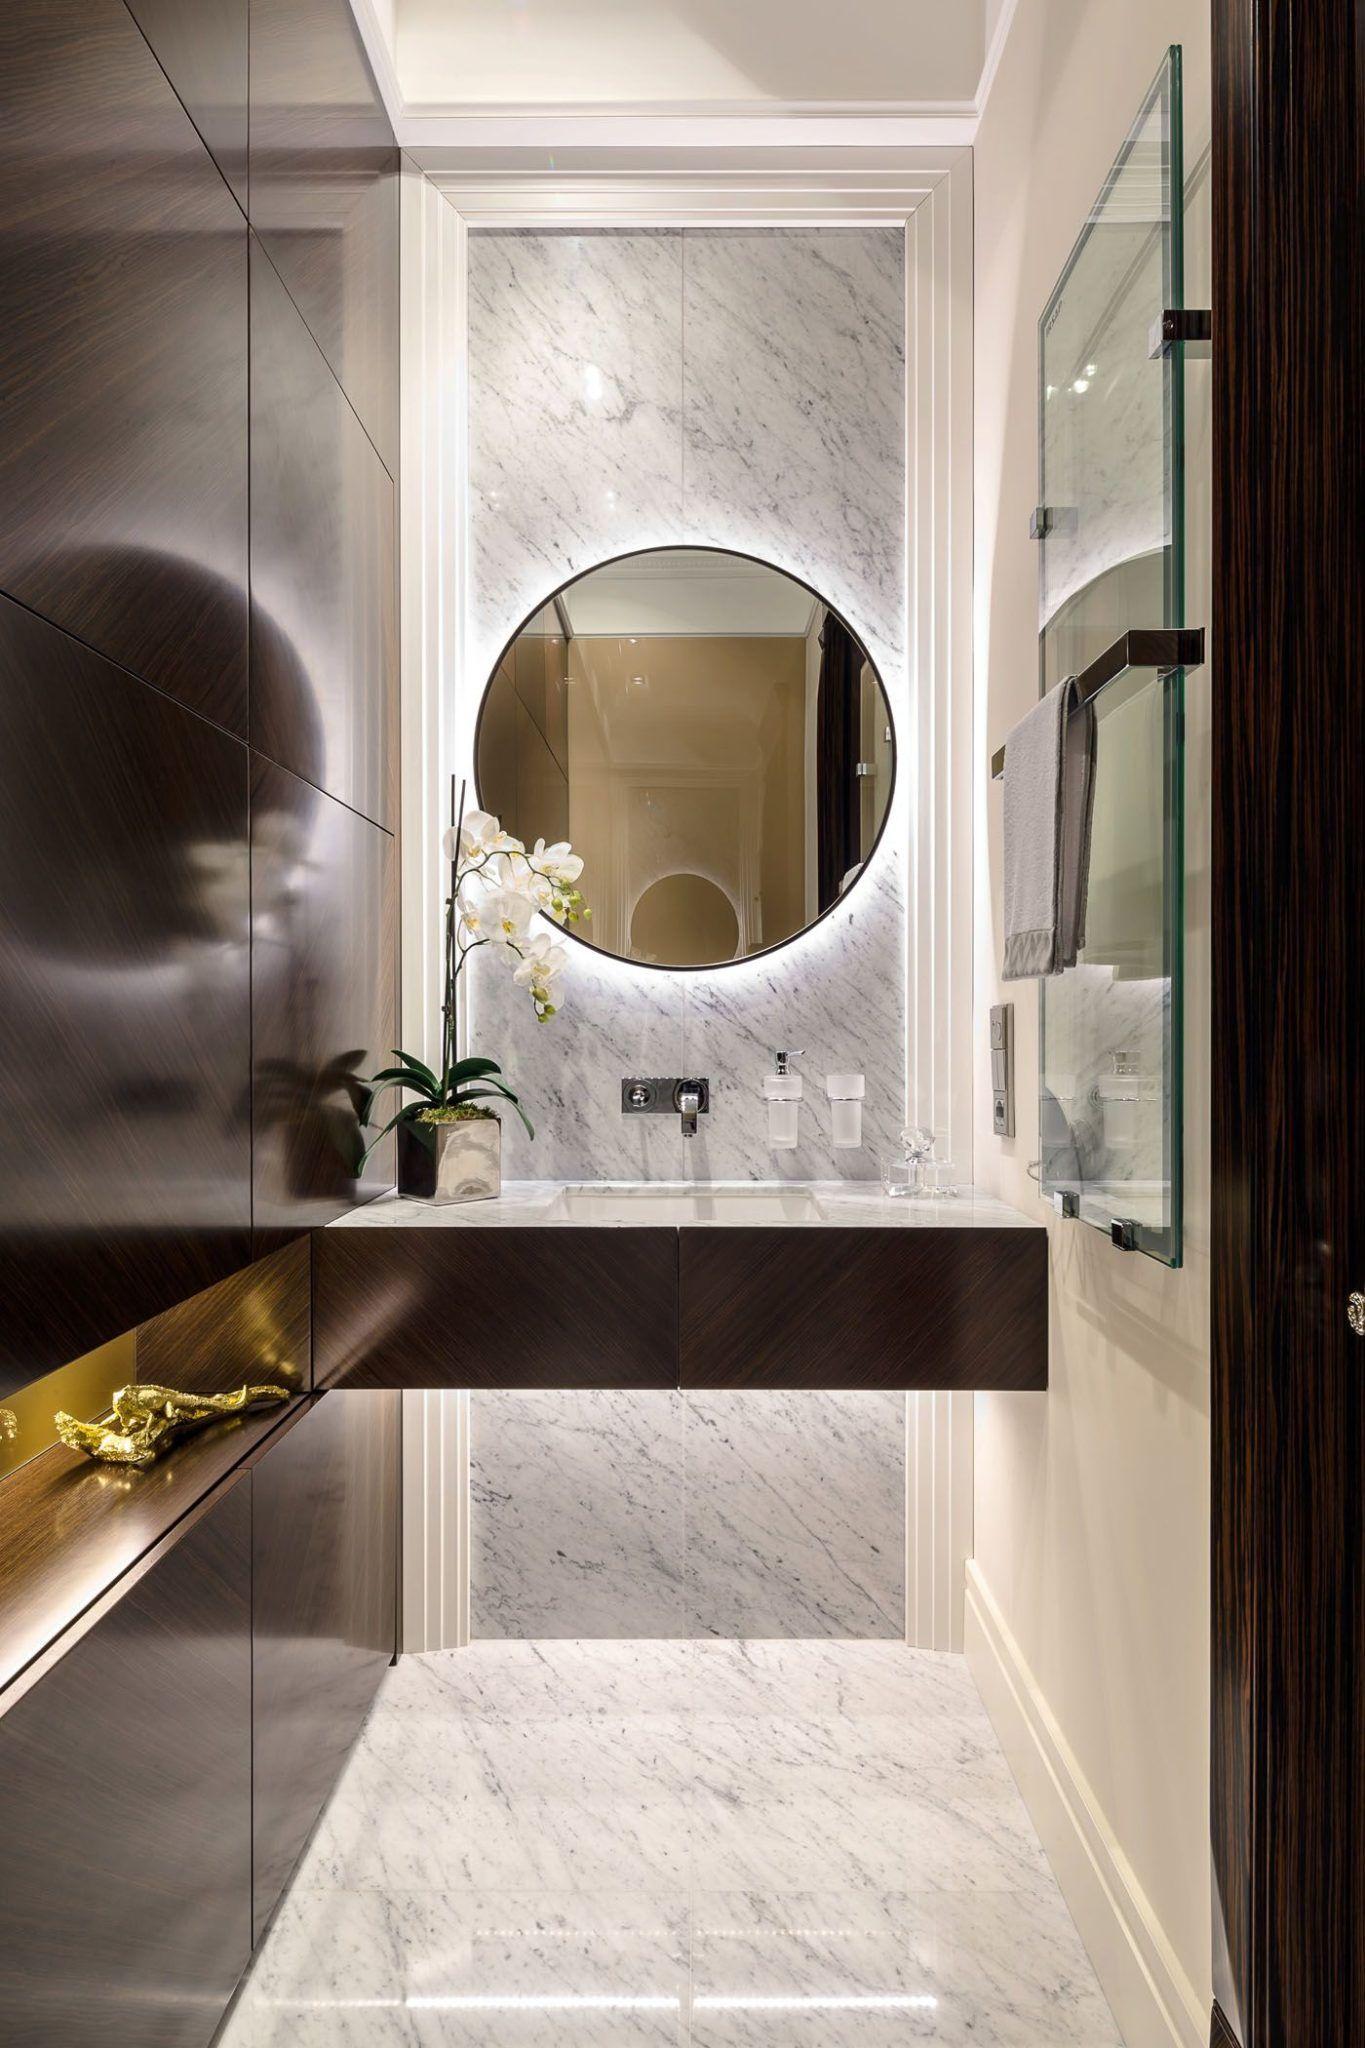 31 Bathroom Lighting Ideas For Every Design Style Site Home Design